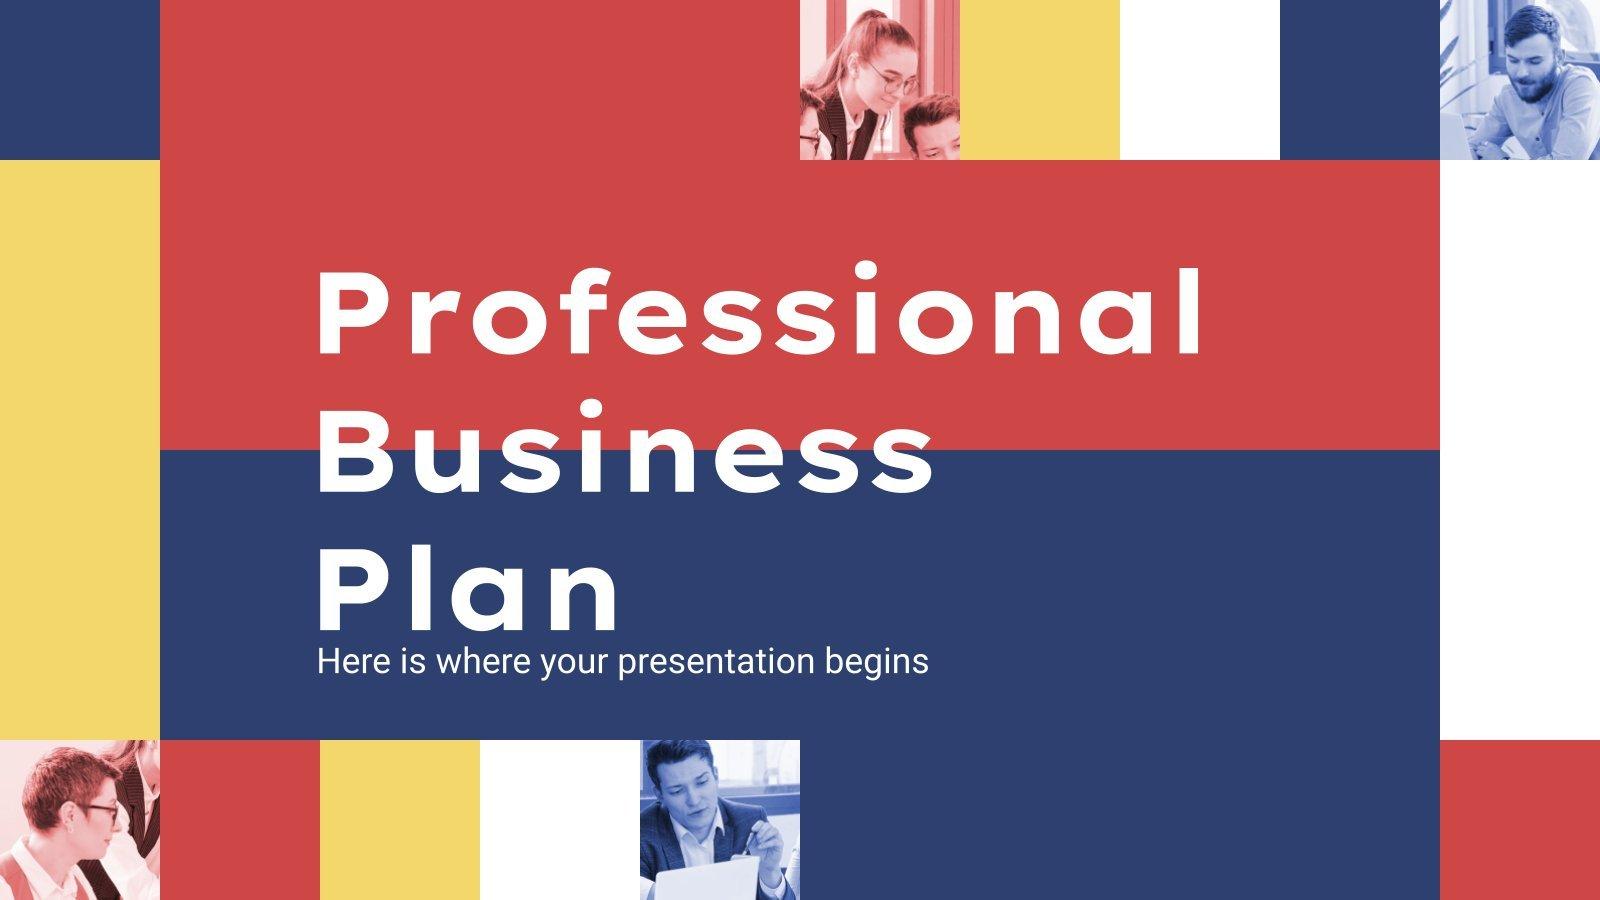 Professional Business Plan presentation template